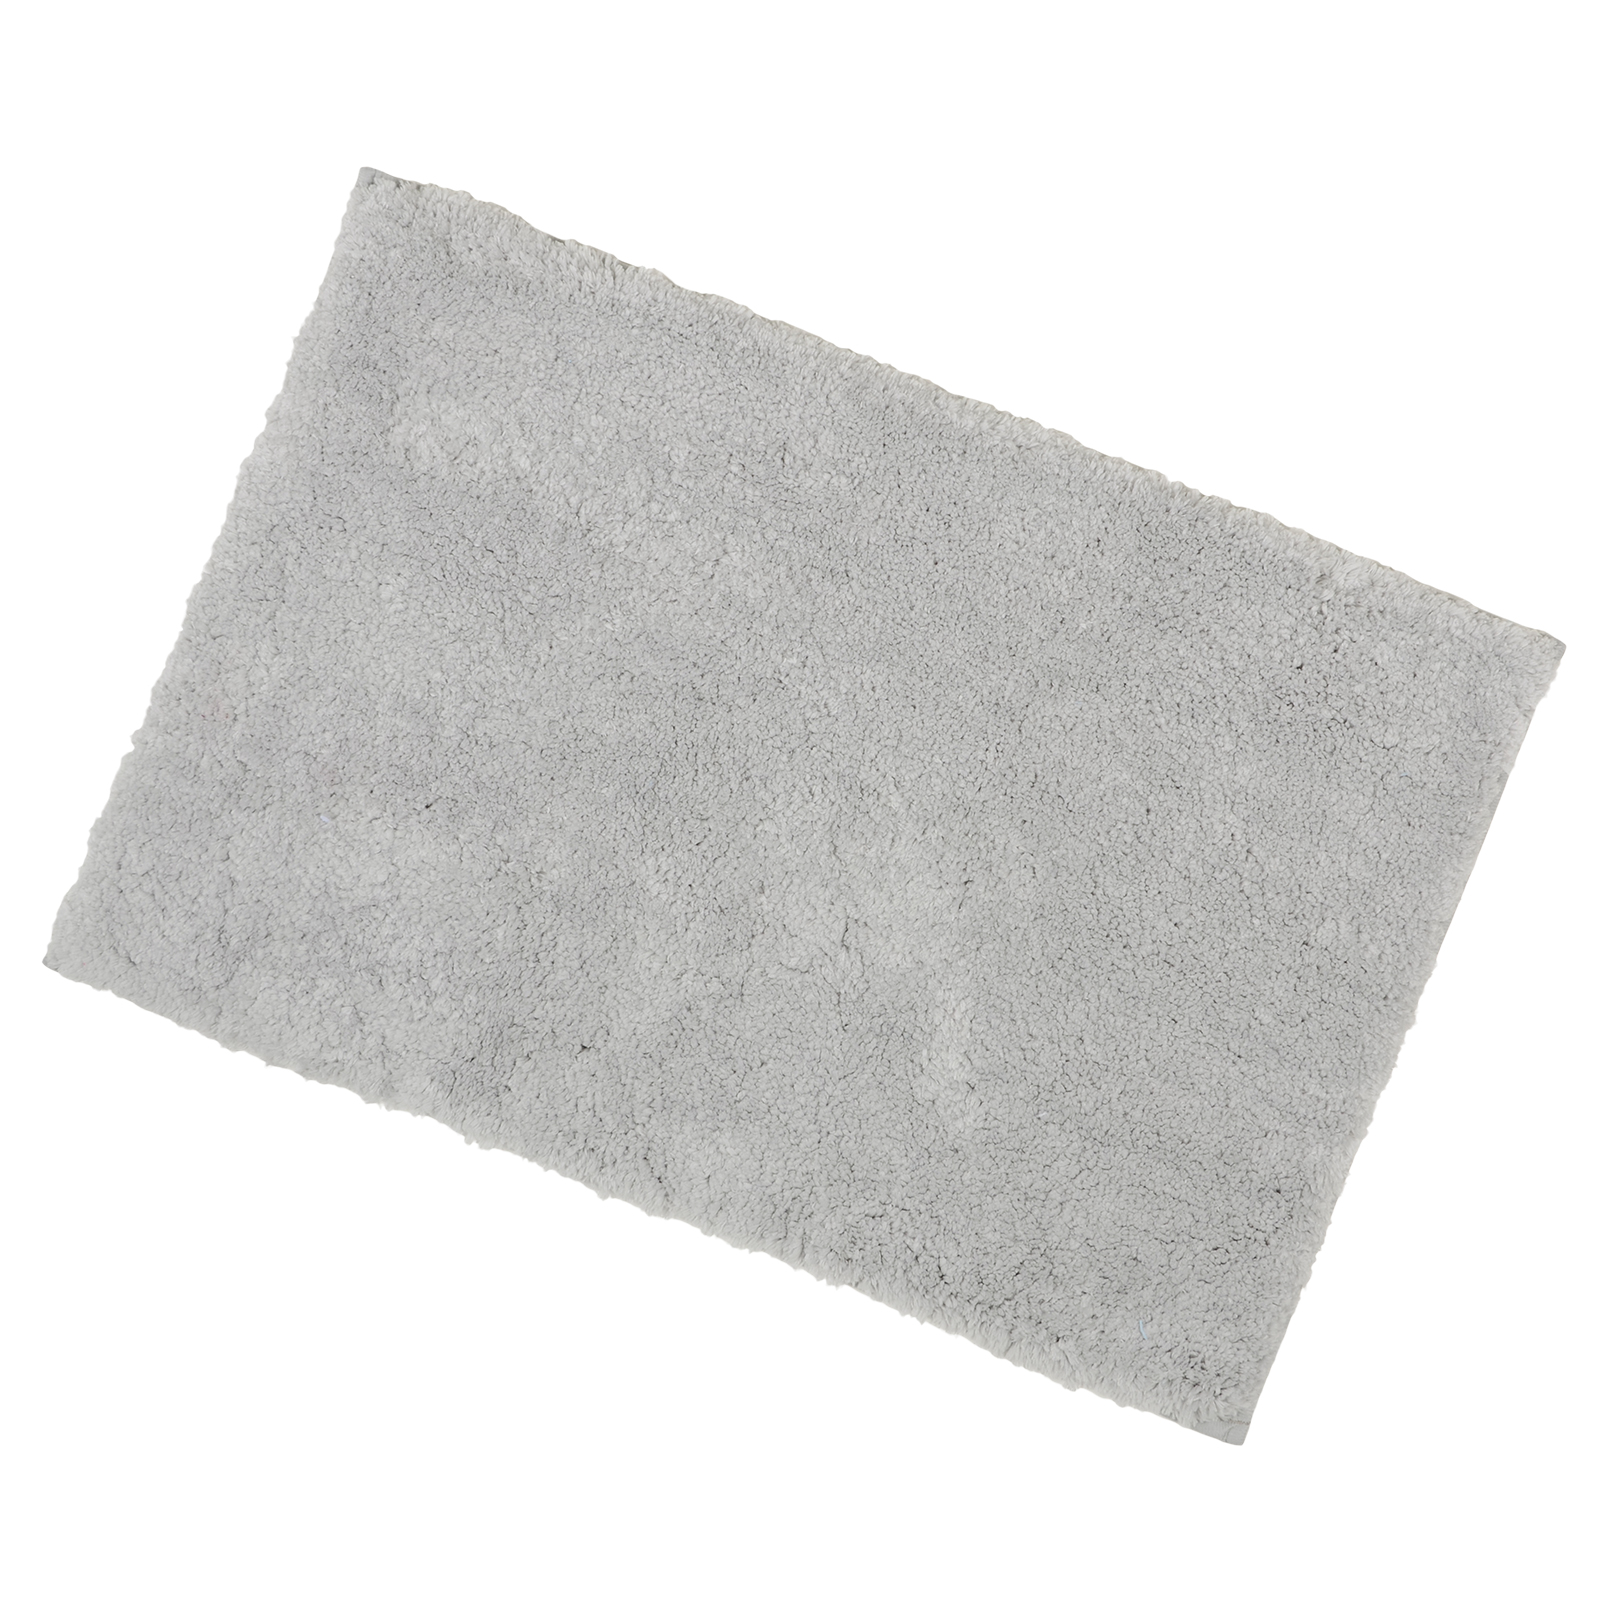 soft tufted microfibre bathroom shower bath mat rug non shower carpet carpet vidalondon